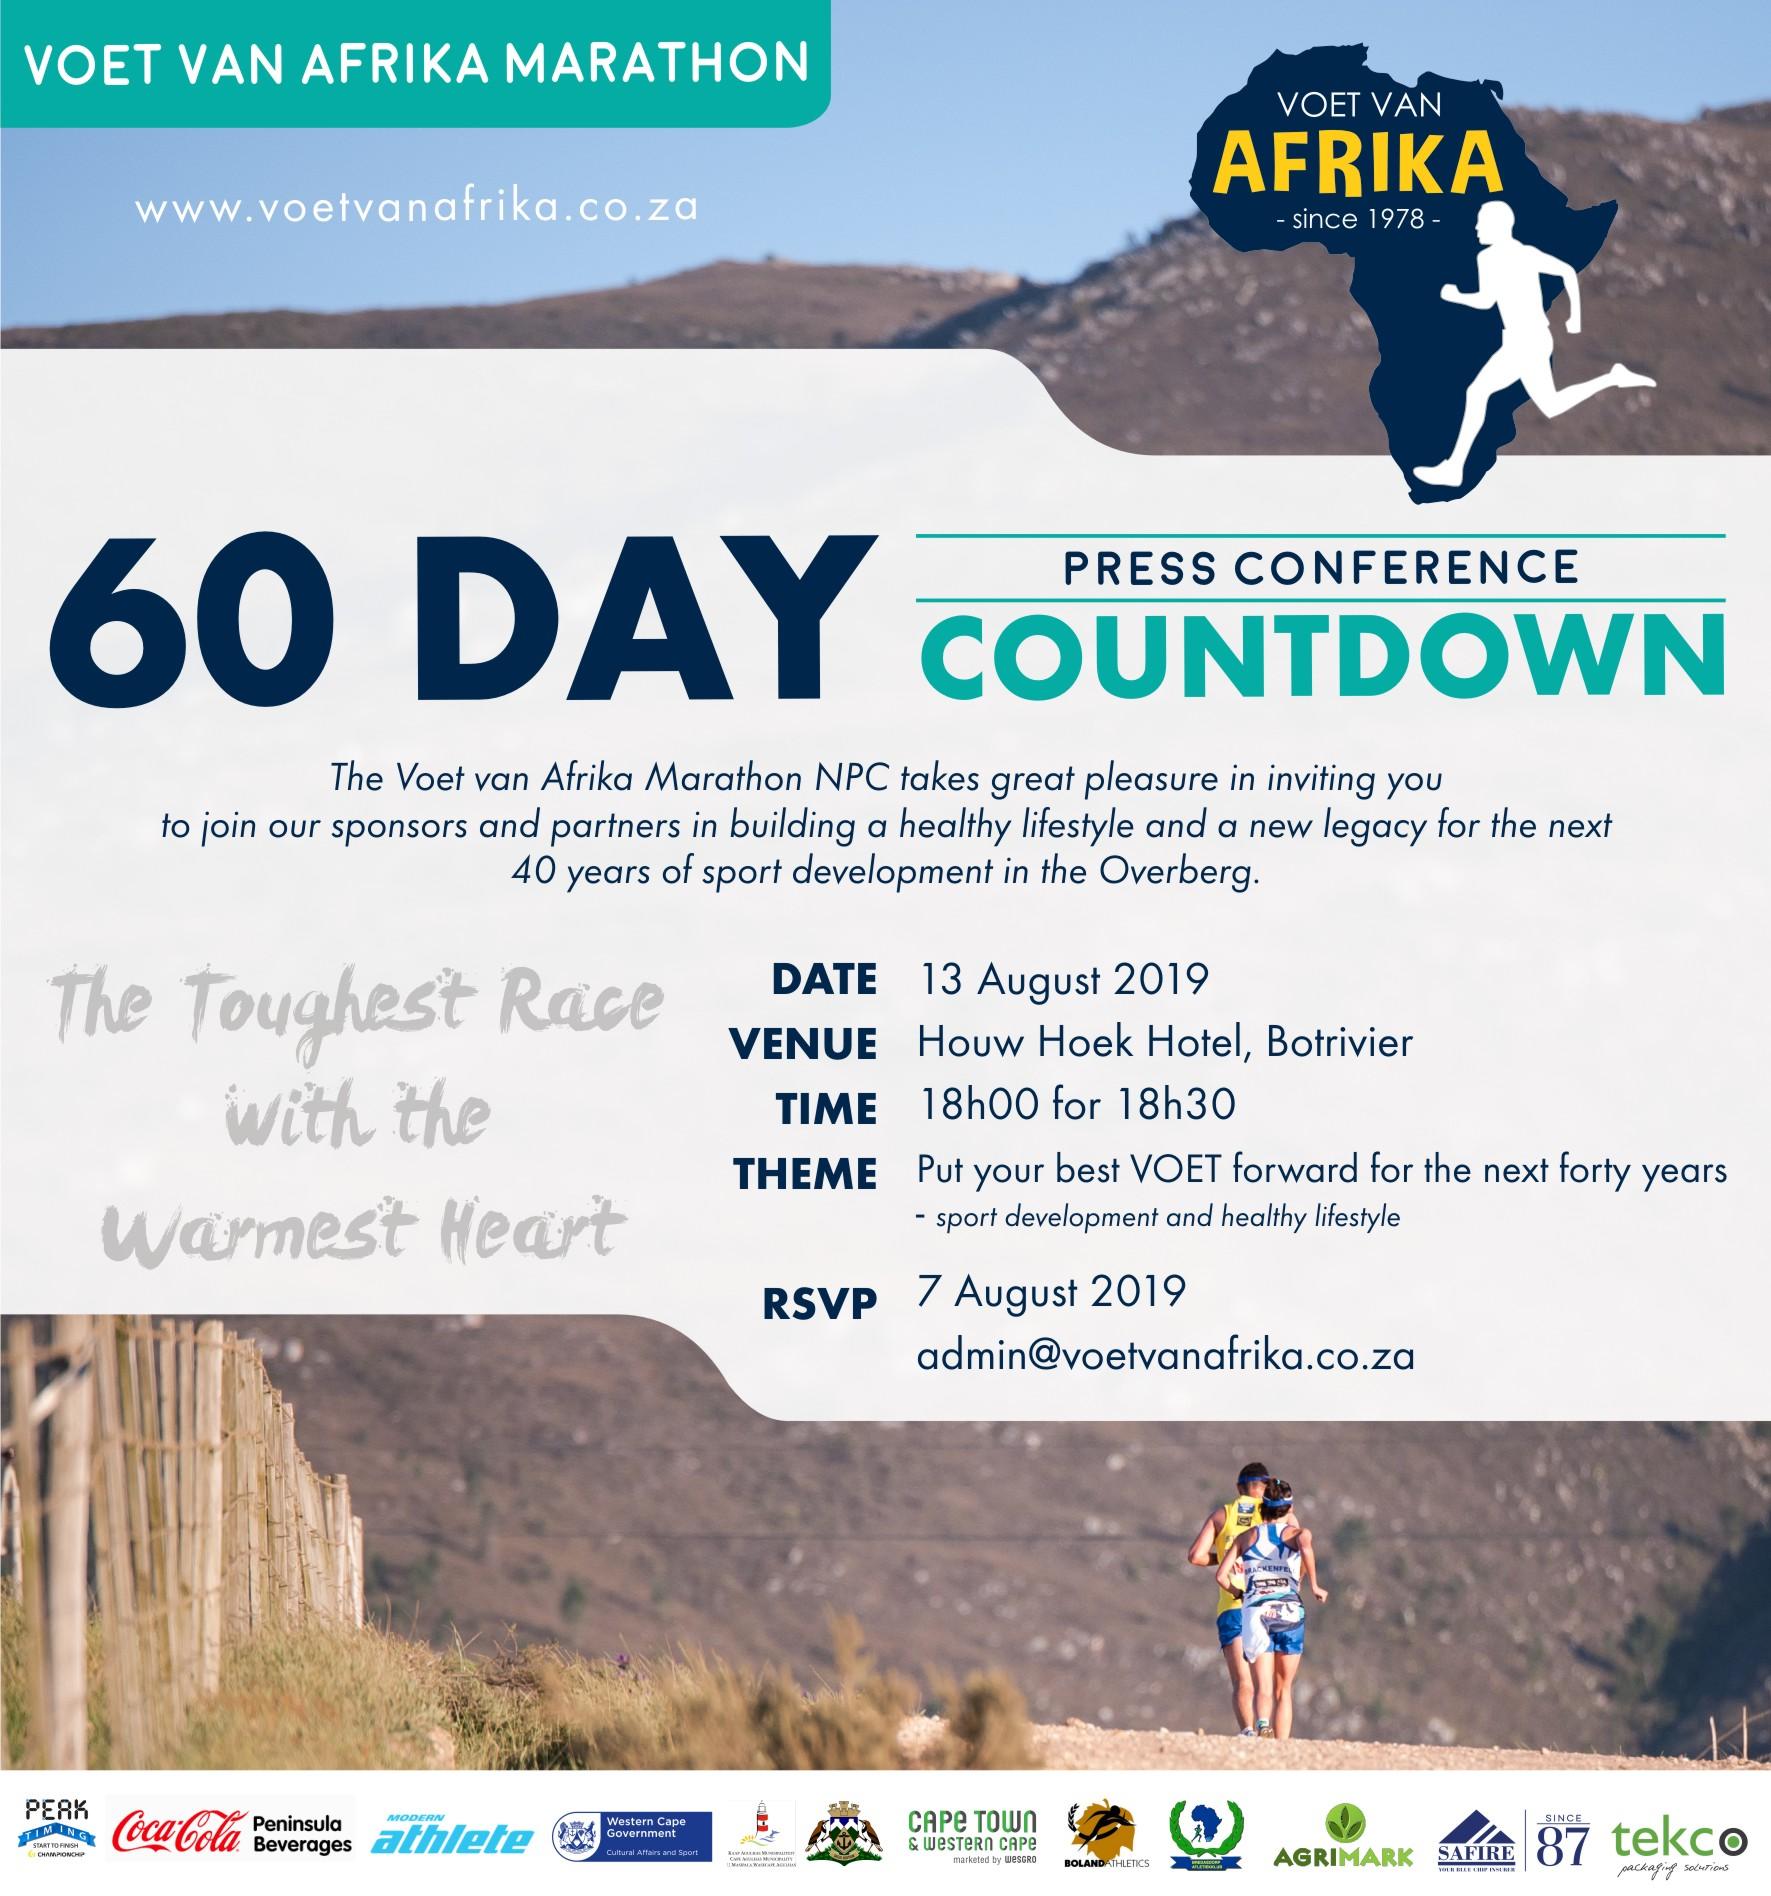 Voet Van Afrika 60 Day Countdown Conference